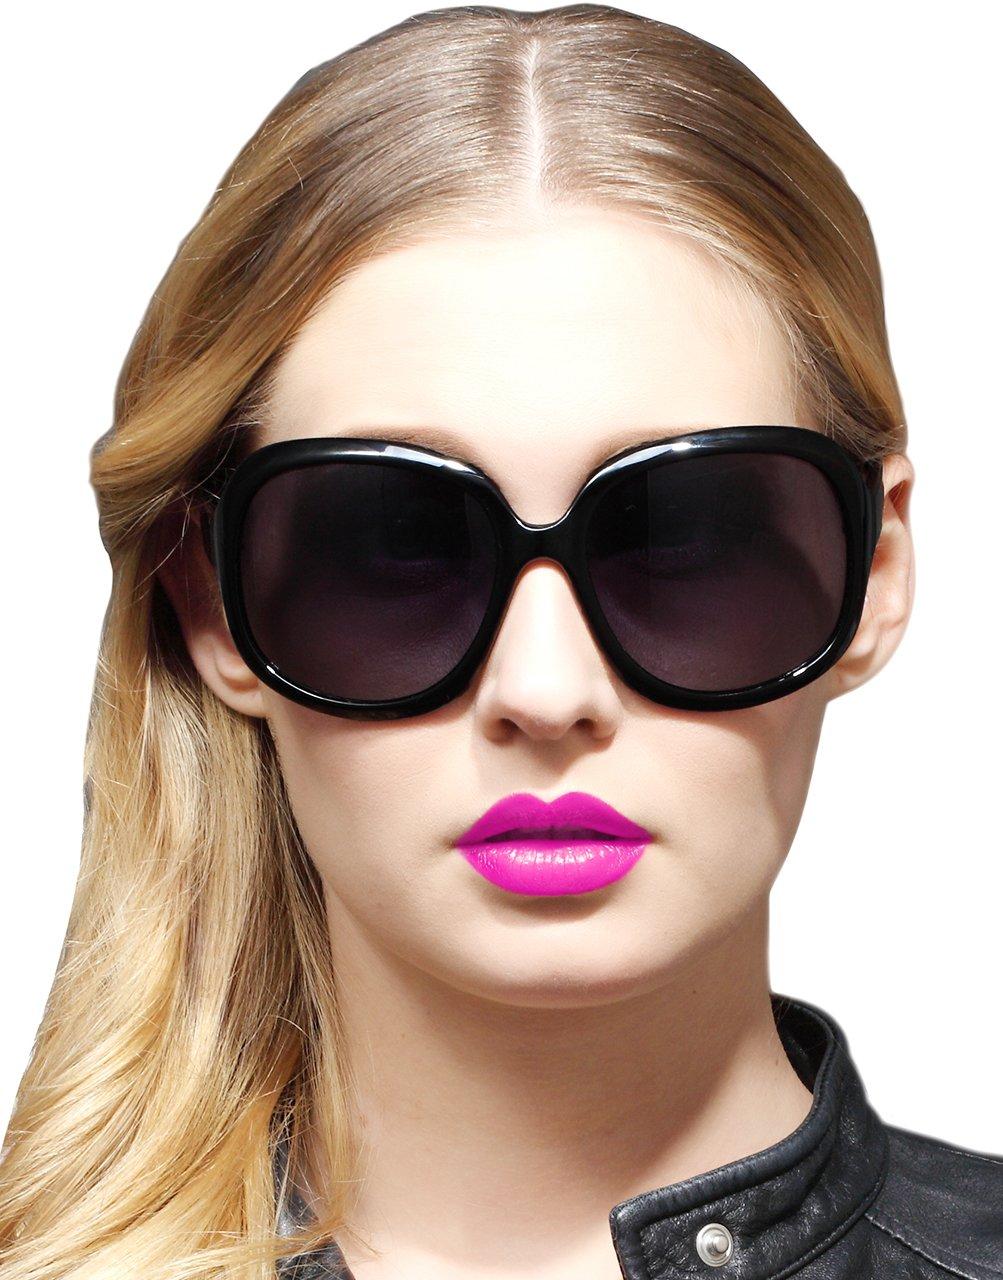 ATTCL-Womens-Oversized-Women-Sunglasses-Uv400-Protection-Polarized-Sunglasses